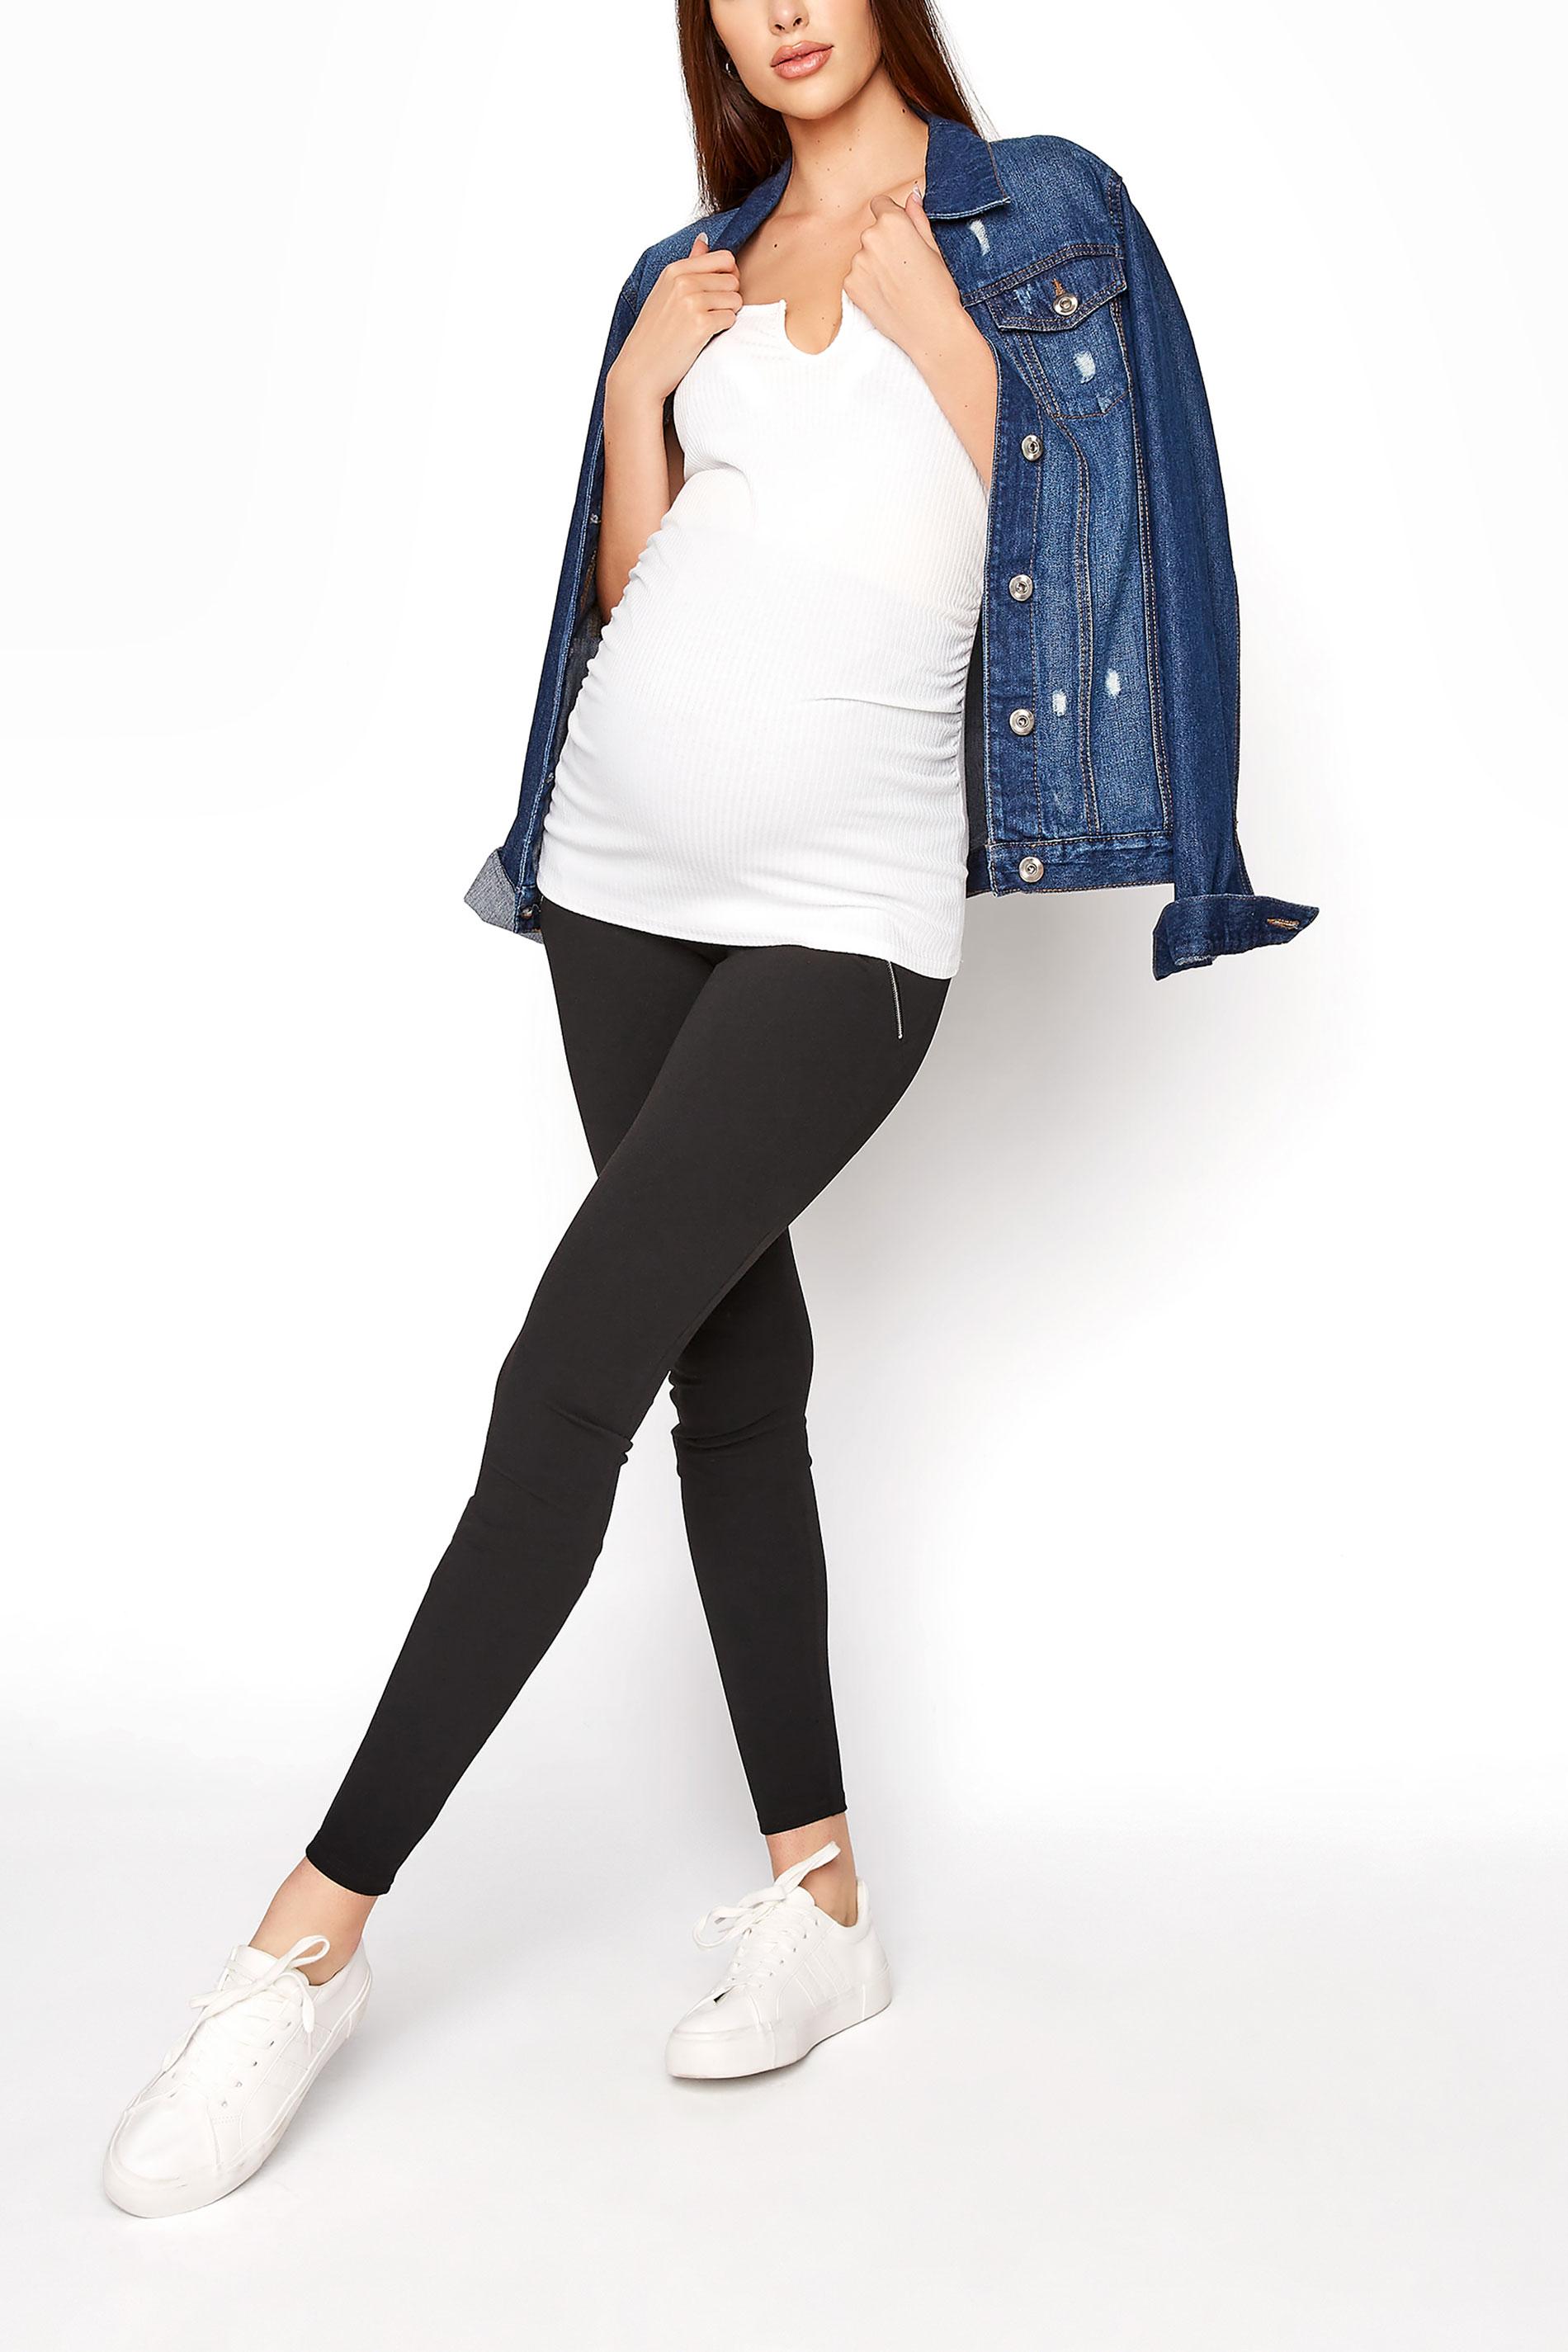 LTS Maternity Black Zip Side Leggings